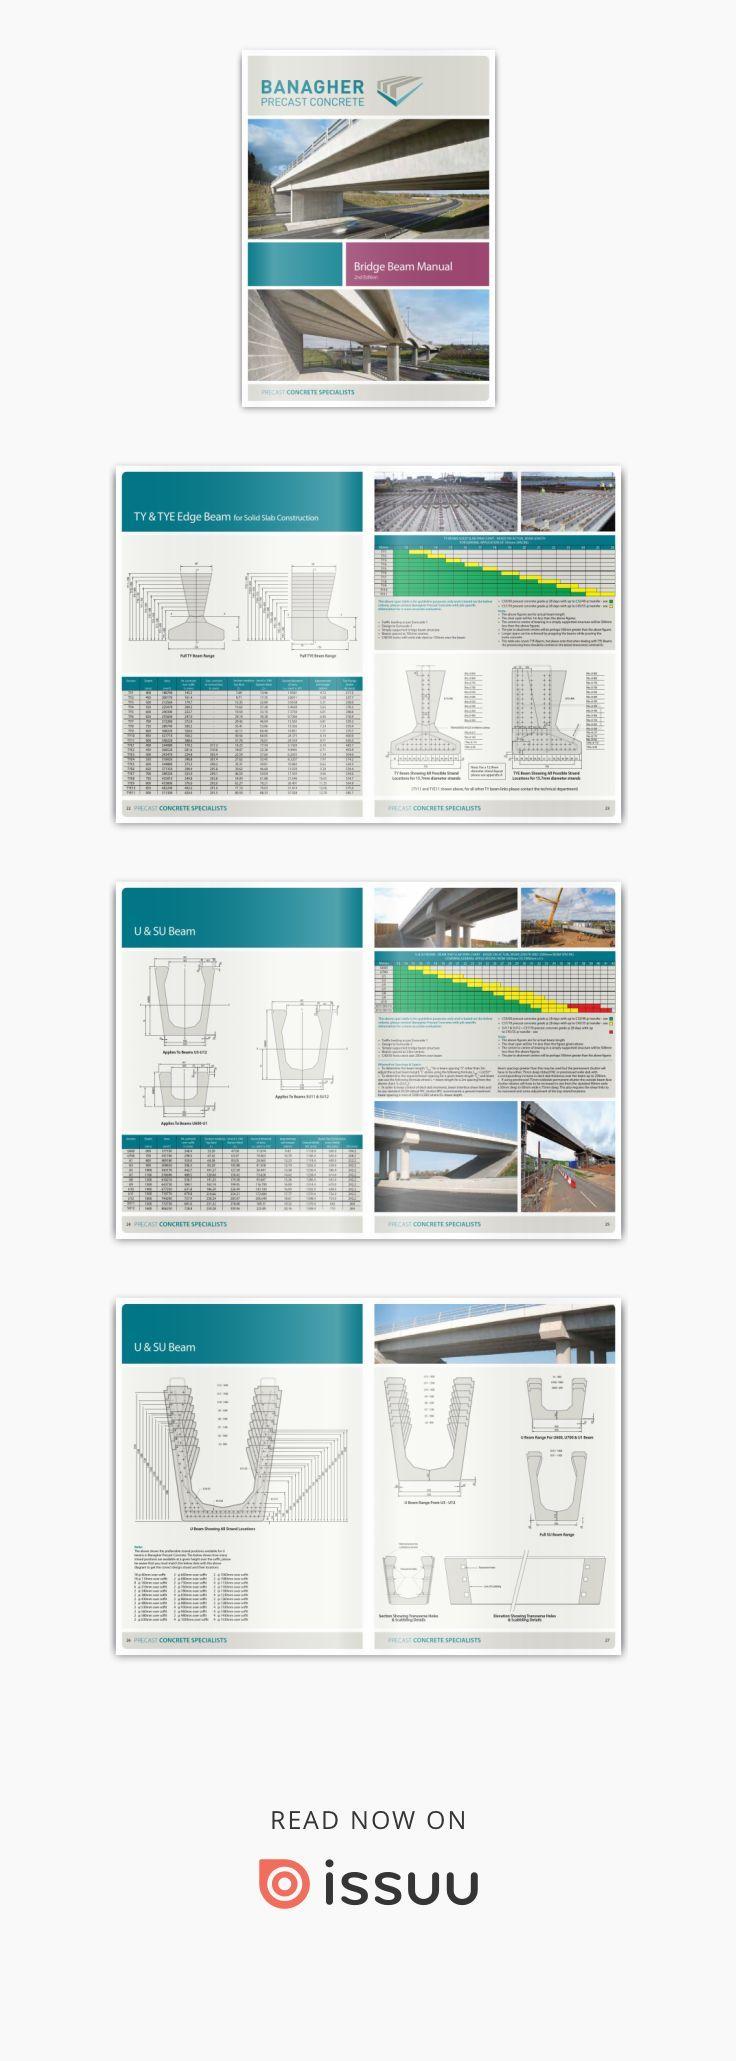 Cantilever Beams Manual Guide